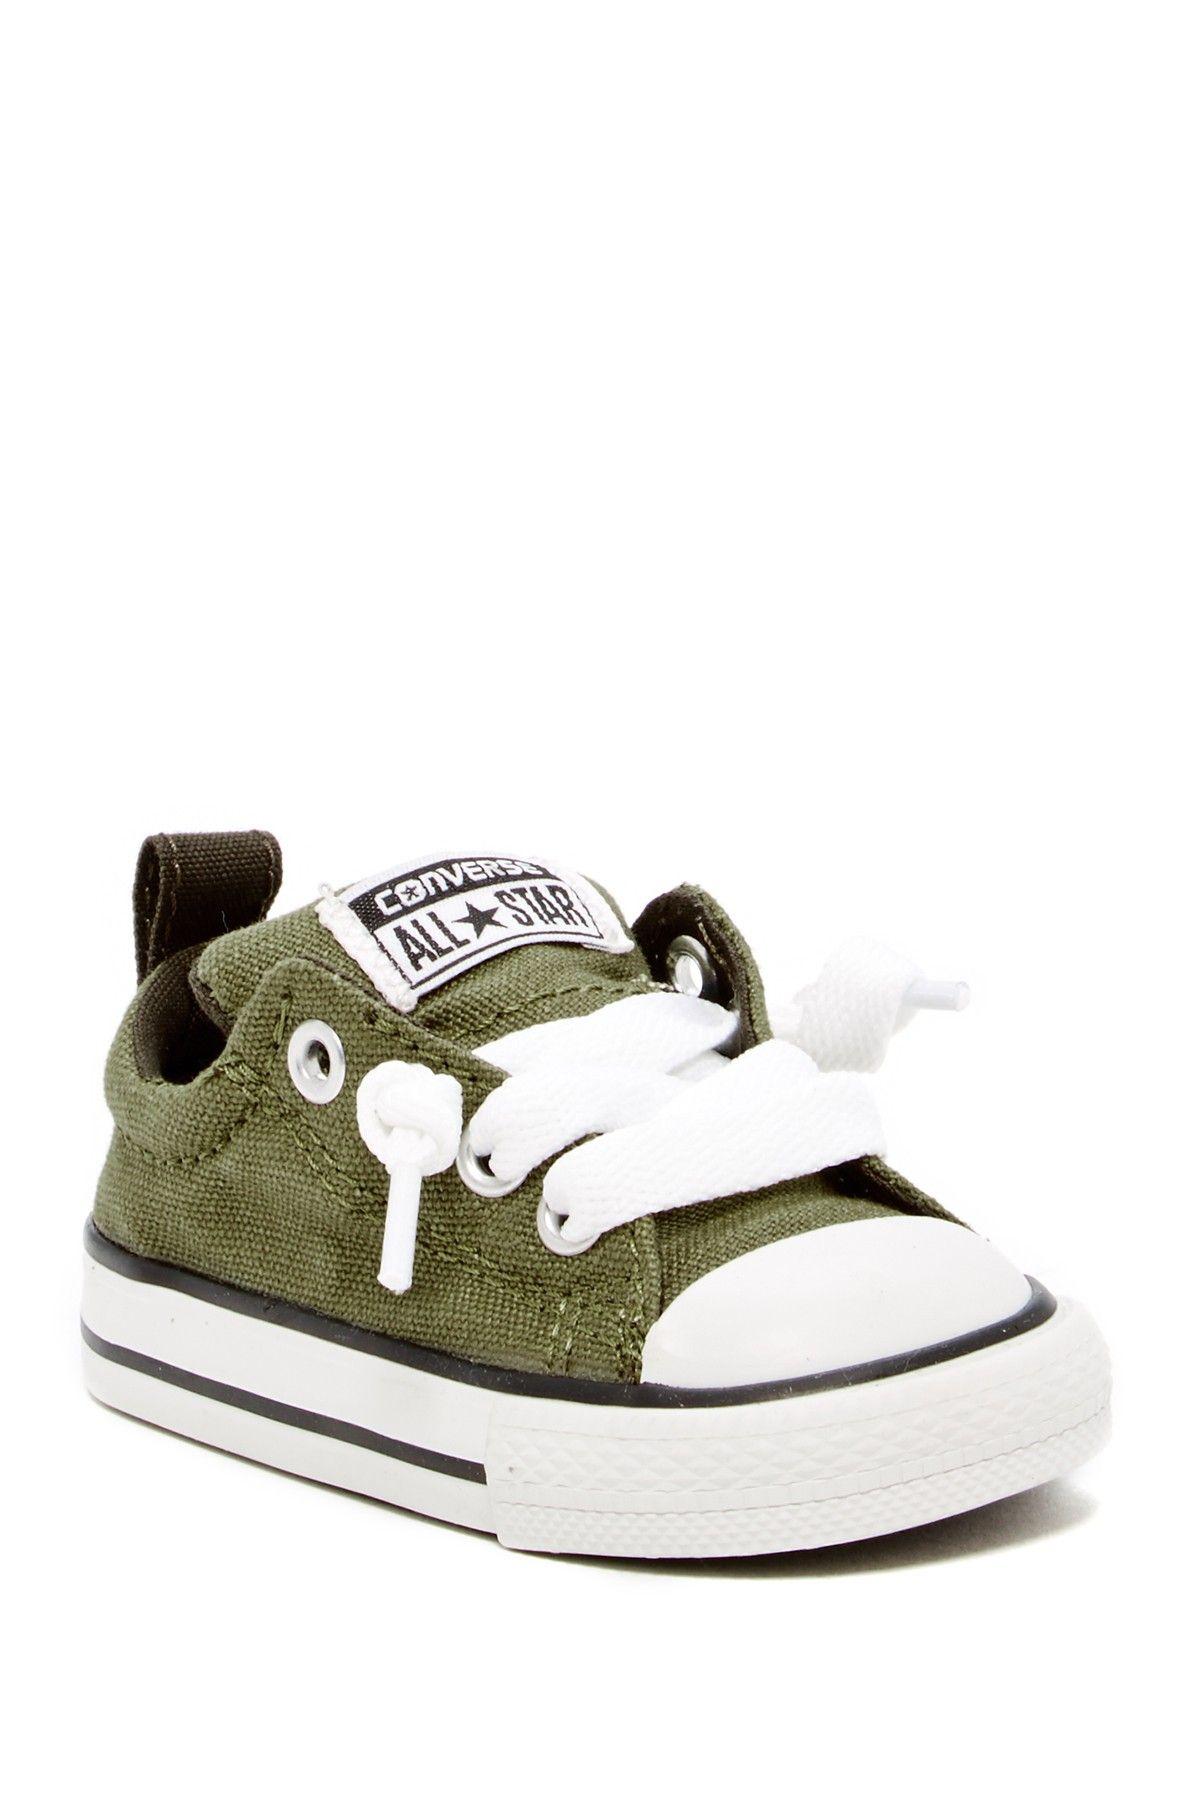 68aeab0b16e9 Chuck Taylor Street Slip Cactus Sneaker (Little Kid   Big Kid) Toddler  Converse